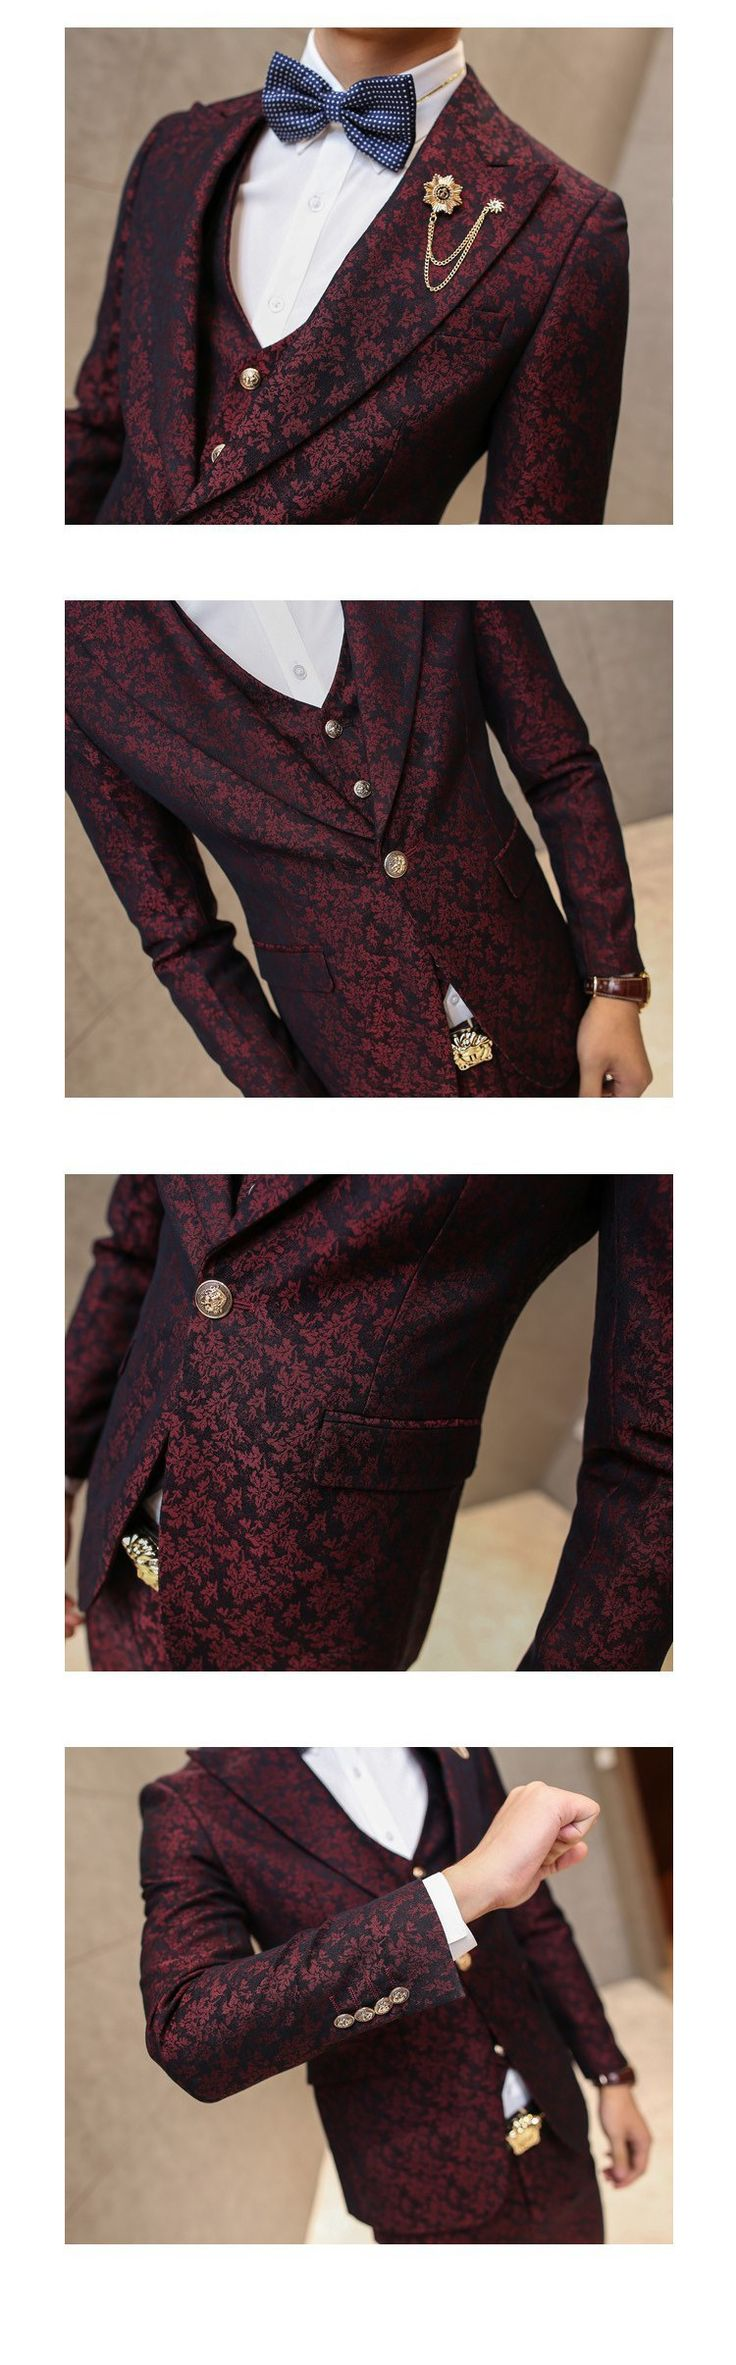 MAUCHLEY Prom Mens Suit With Pants Burgundy Floral Jacquard Wedding Suits for Men Slim Fit 3 Pieces / Set (Jacket+Vest+Pants) | We Global Trade